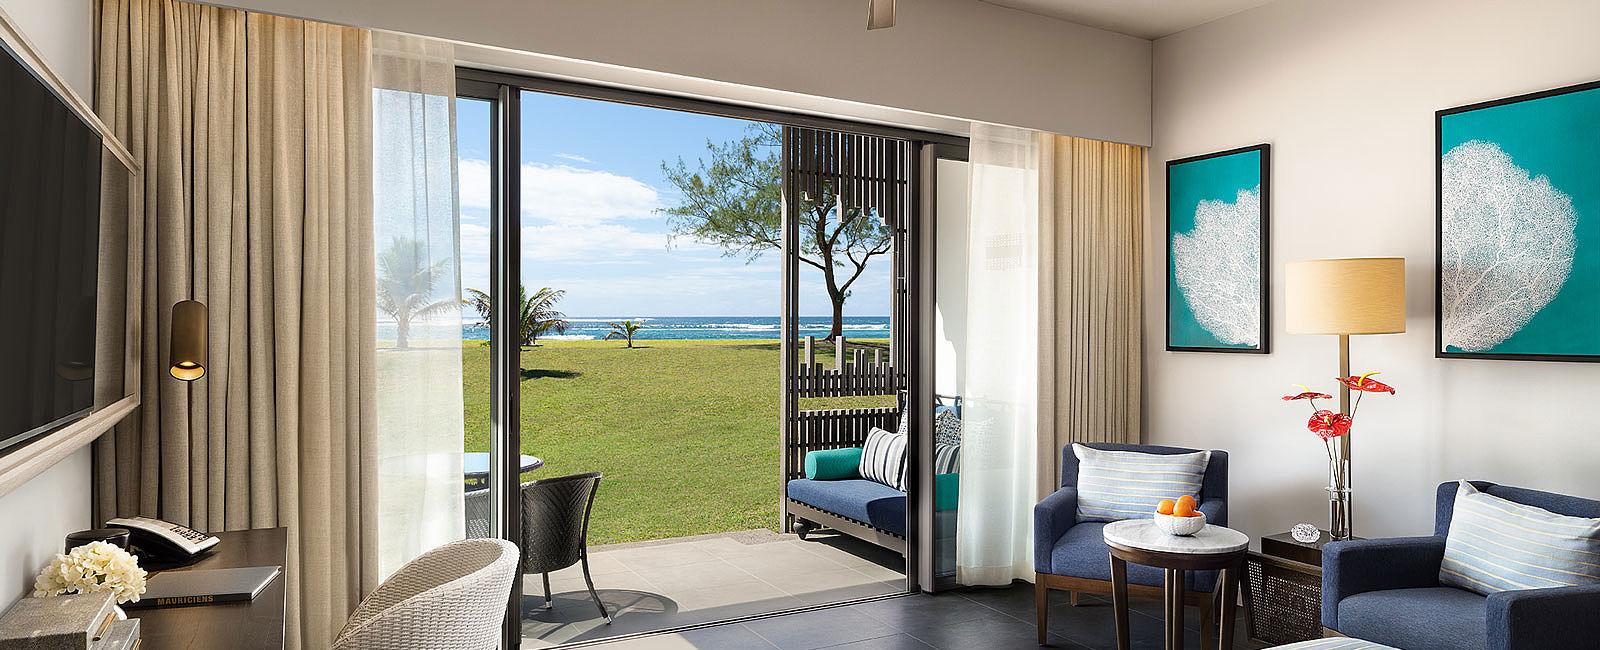 Anantara Hotels Resorts Amp Spas Eroffnet Auf Mauritius